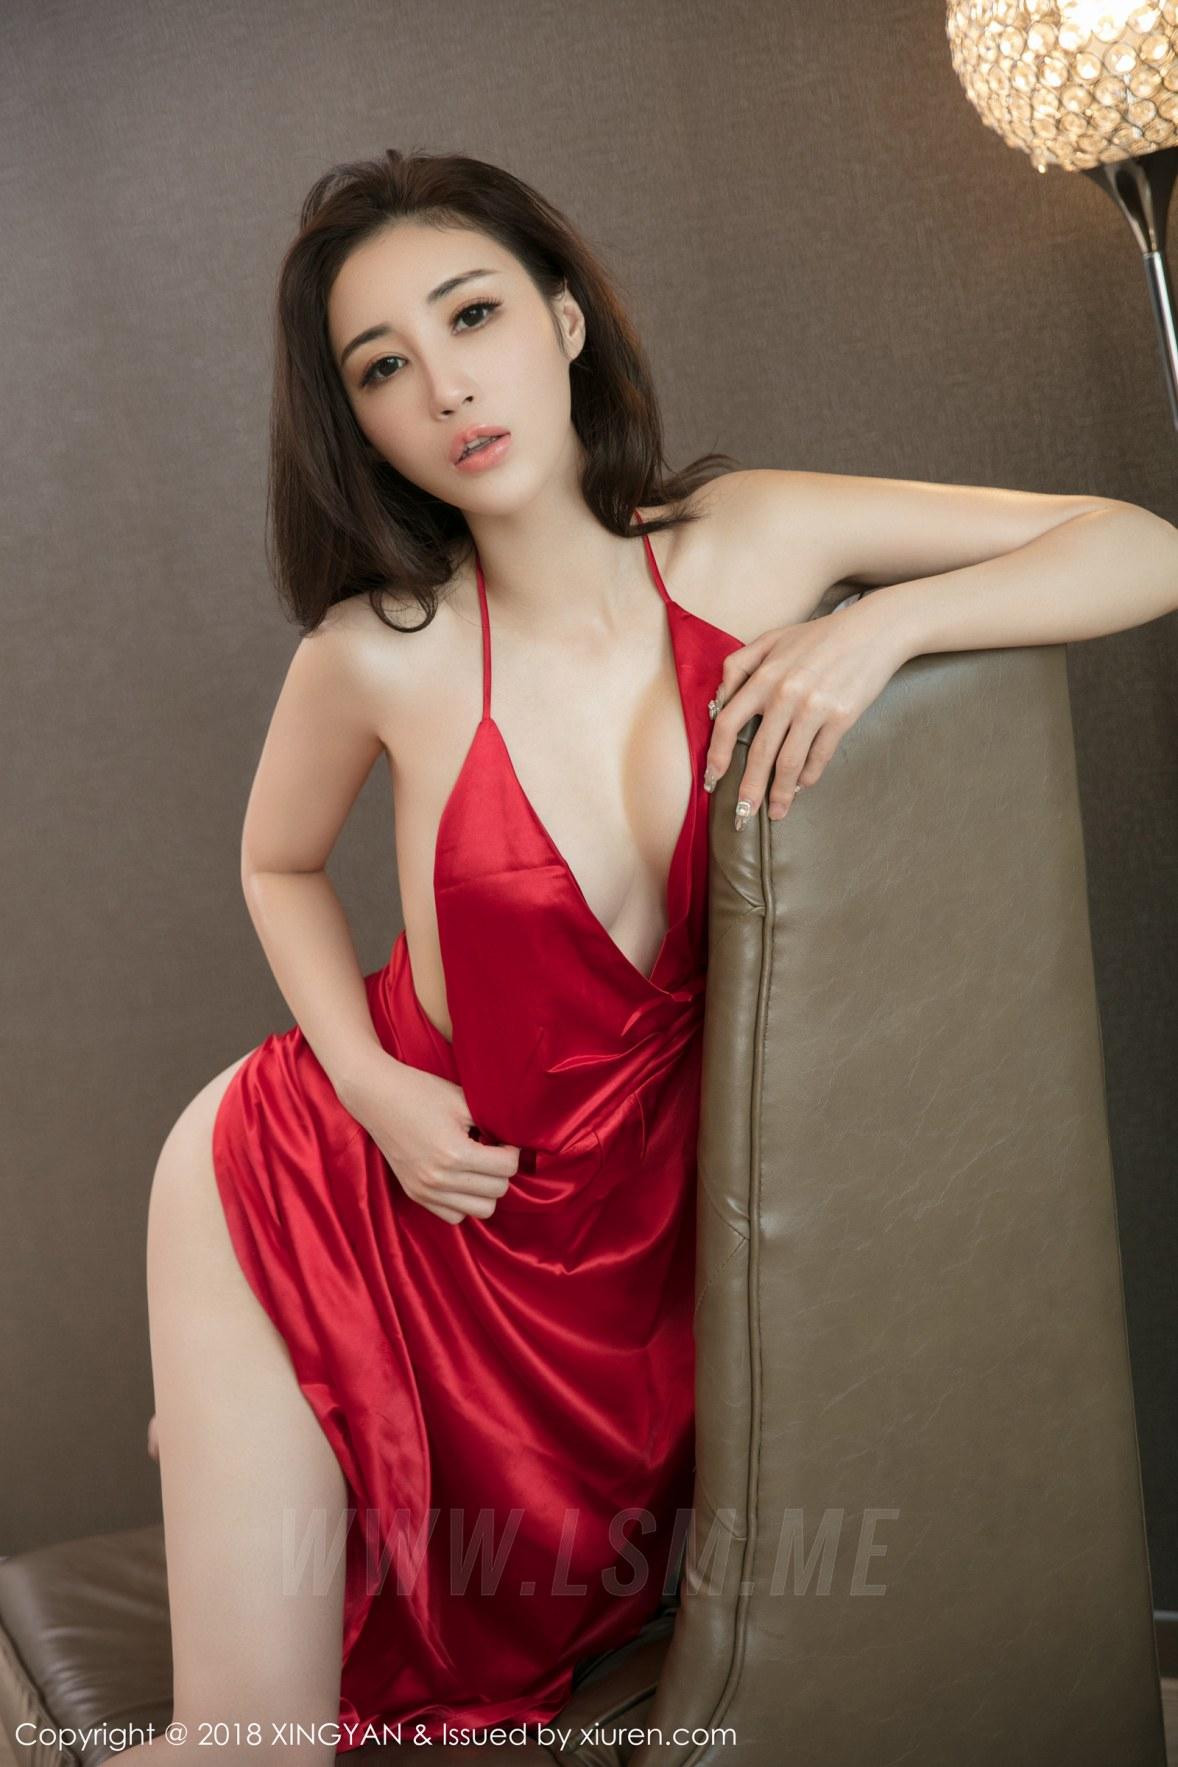 XIMGYAN 星颜社 Vol.015 Modo 孙梦瑶V - 4